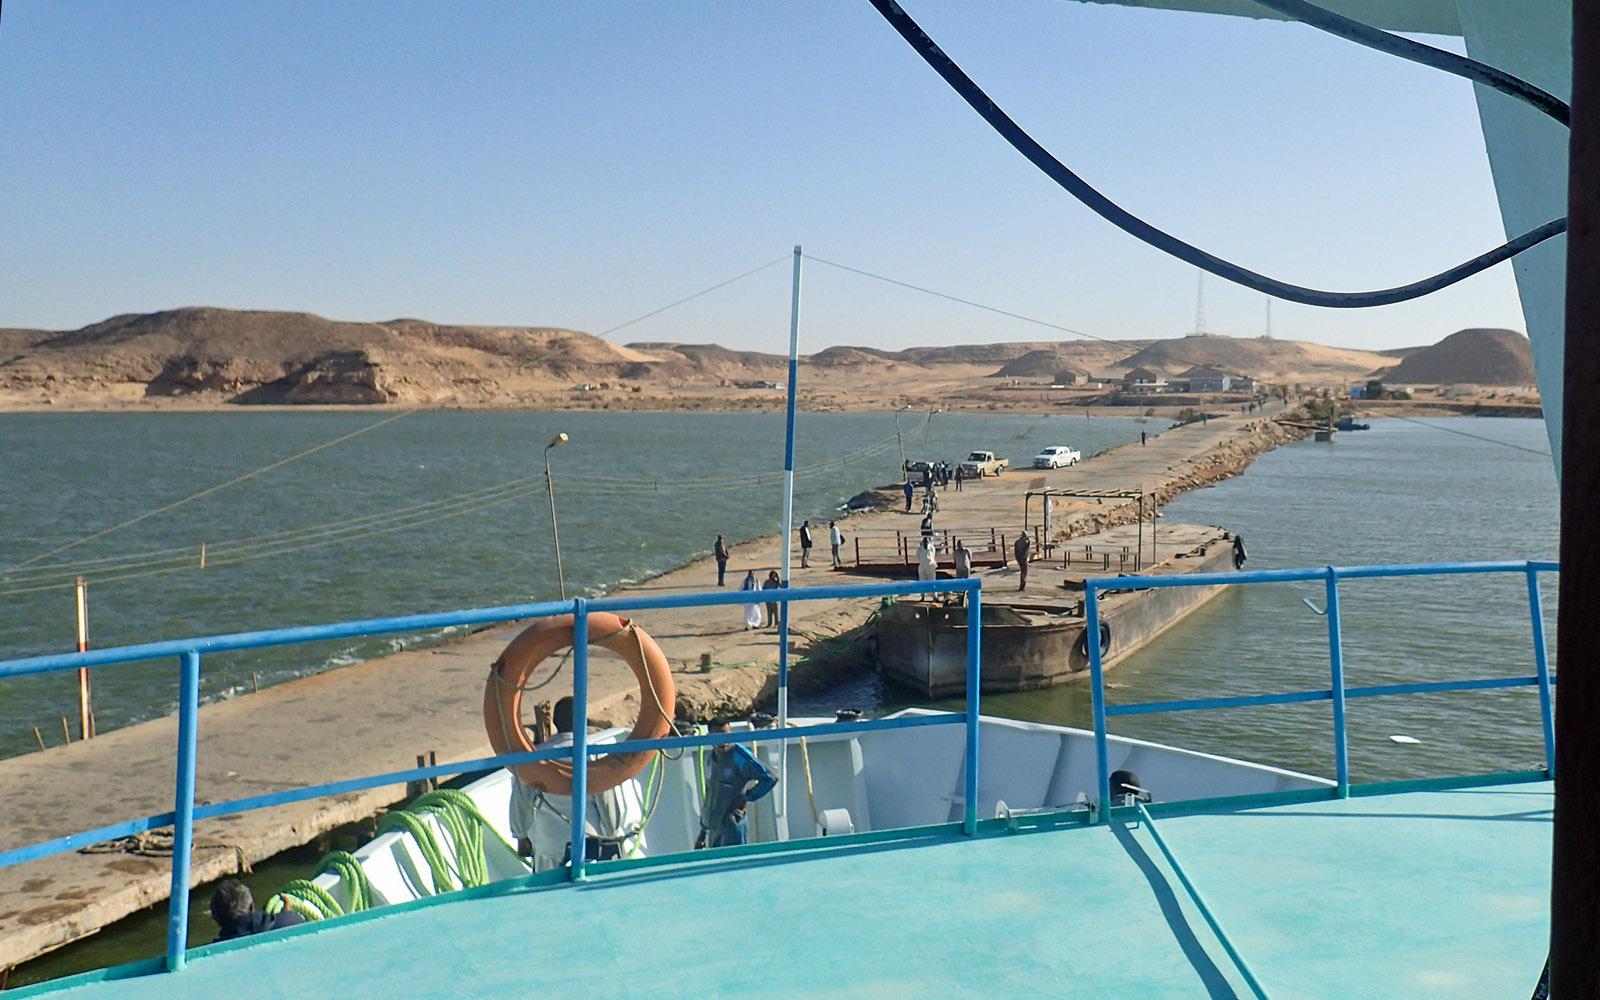 Wadi Halfa Peer